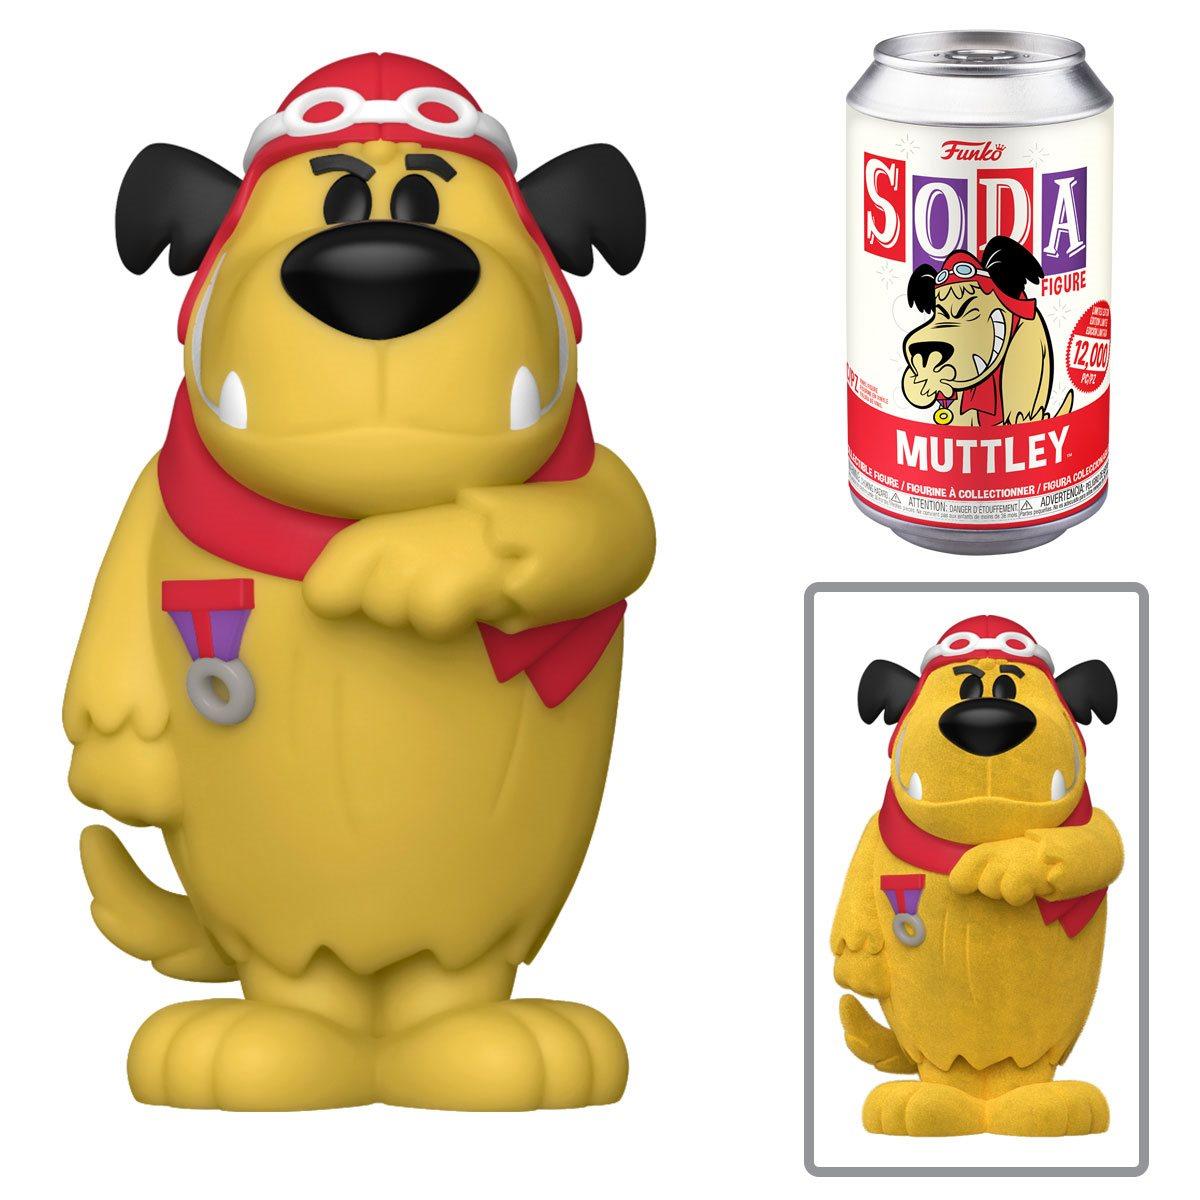 PRÉ VENDA: Lata Pop! Muttley: Hanna Barbera Vinyl Soda: ( Edição Limitada) - Funko